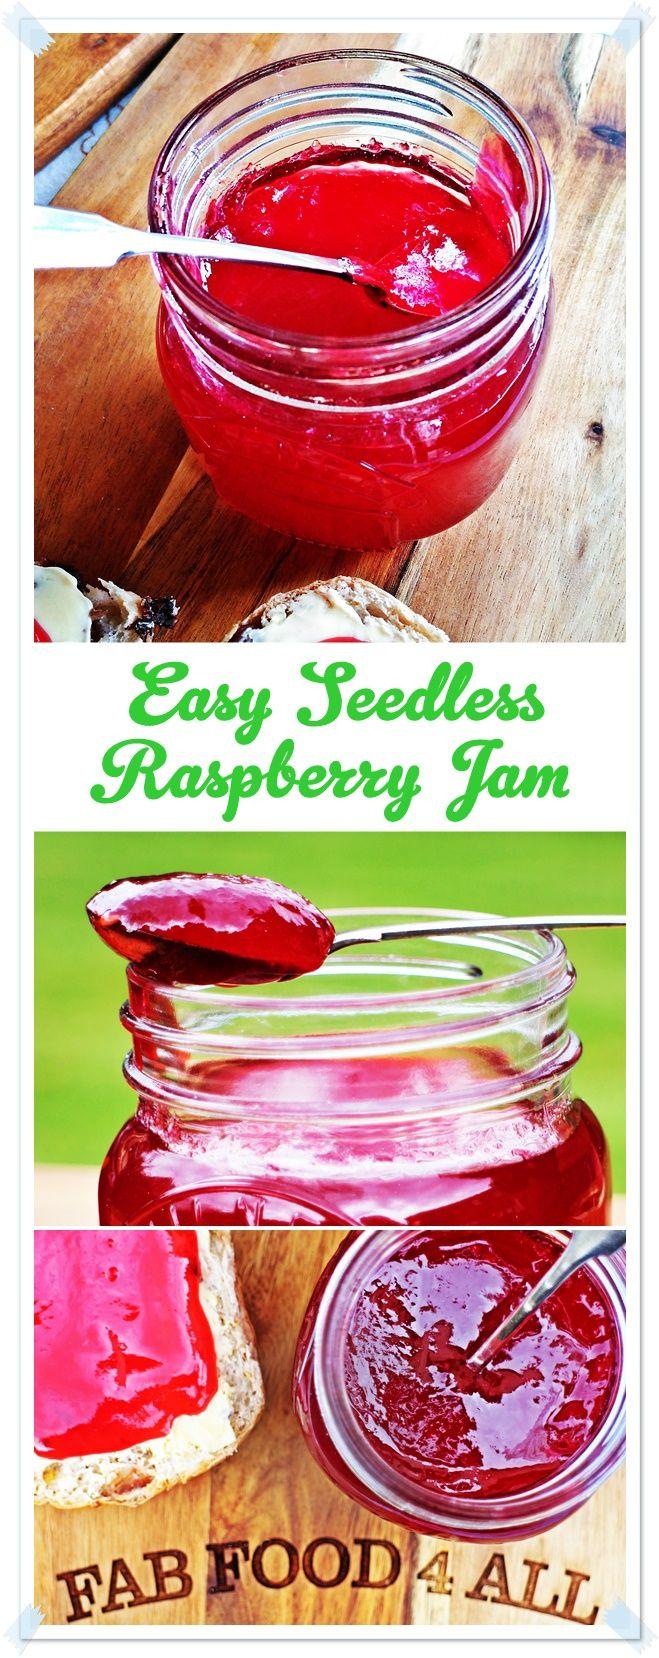 Easy Seedless Raspberry Jam Fab Food 4 All In 2019